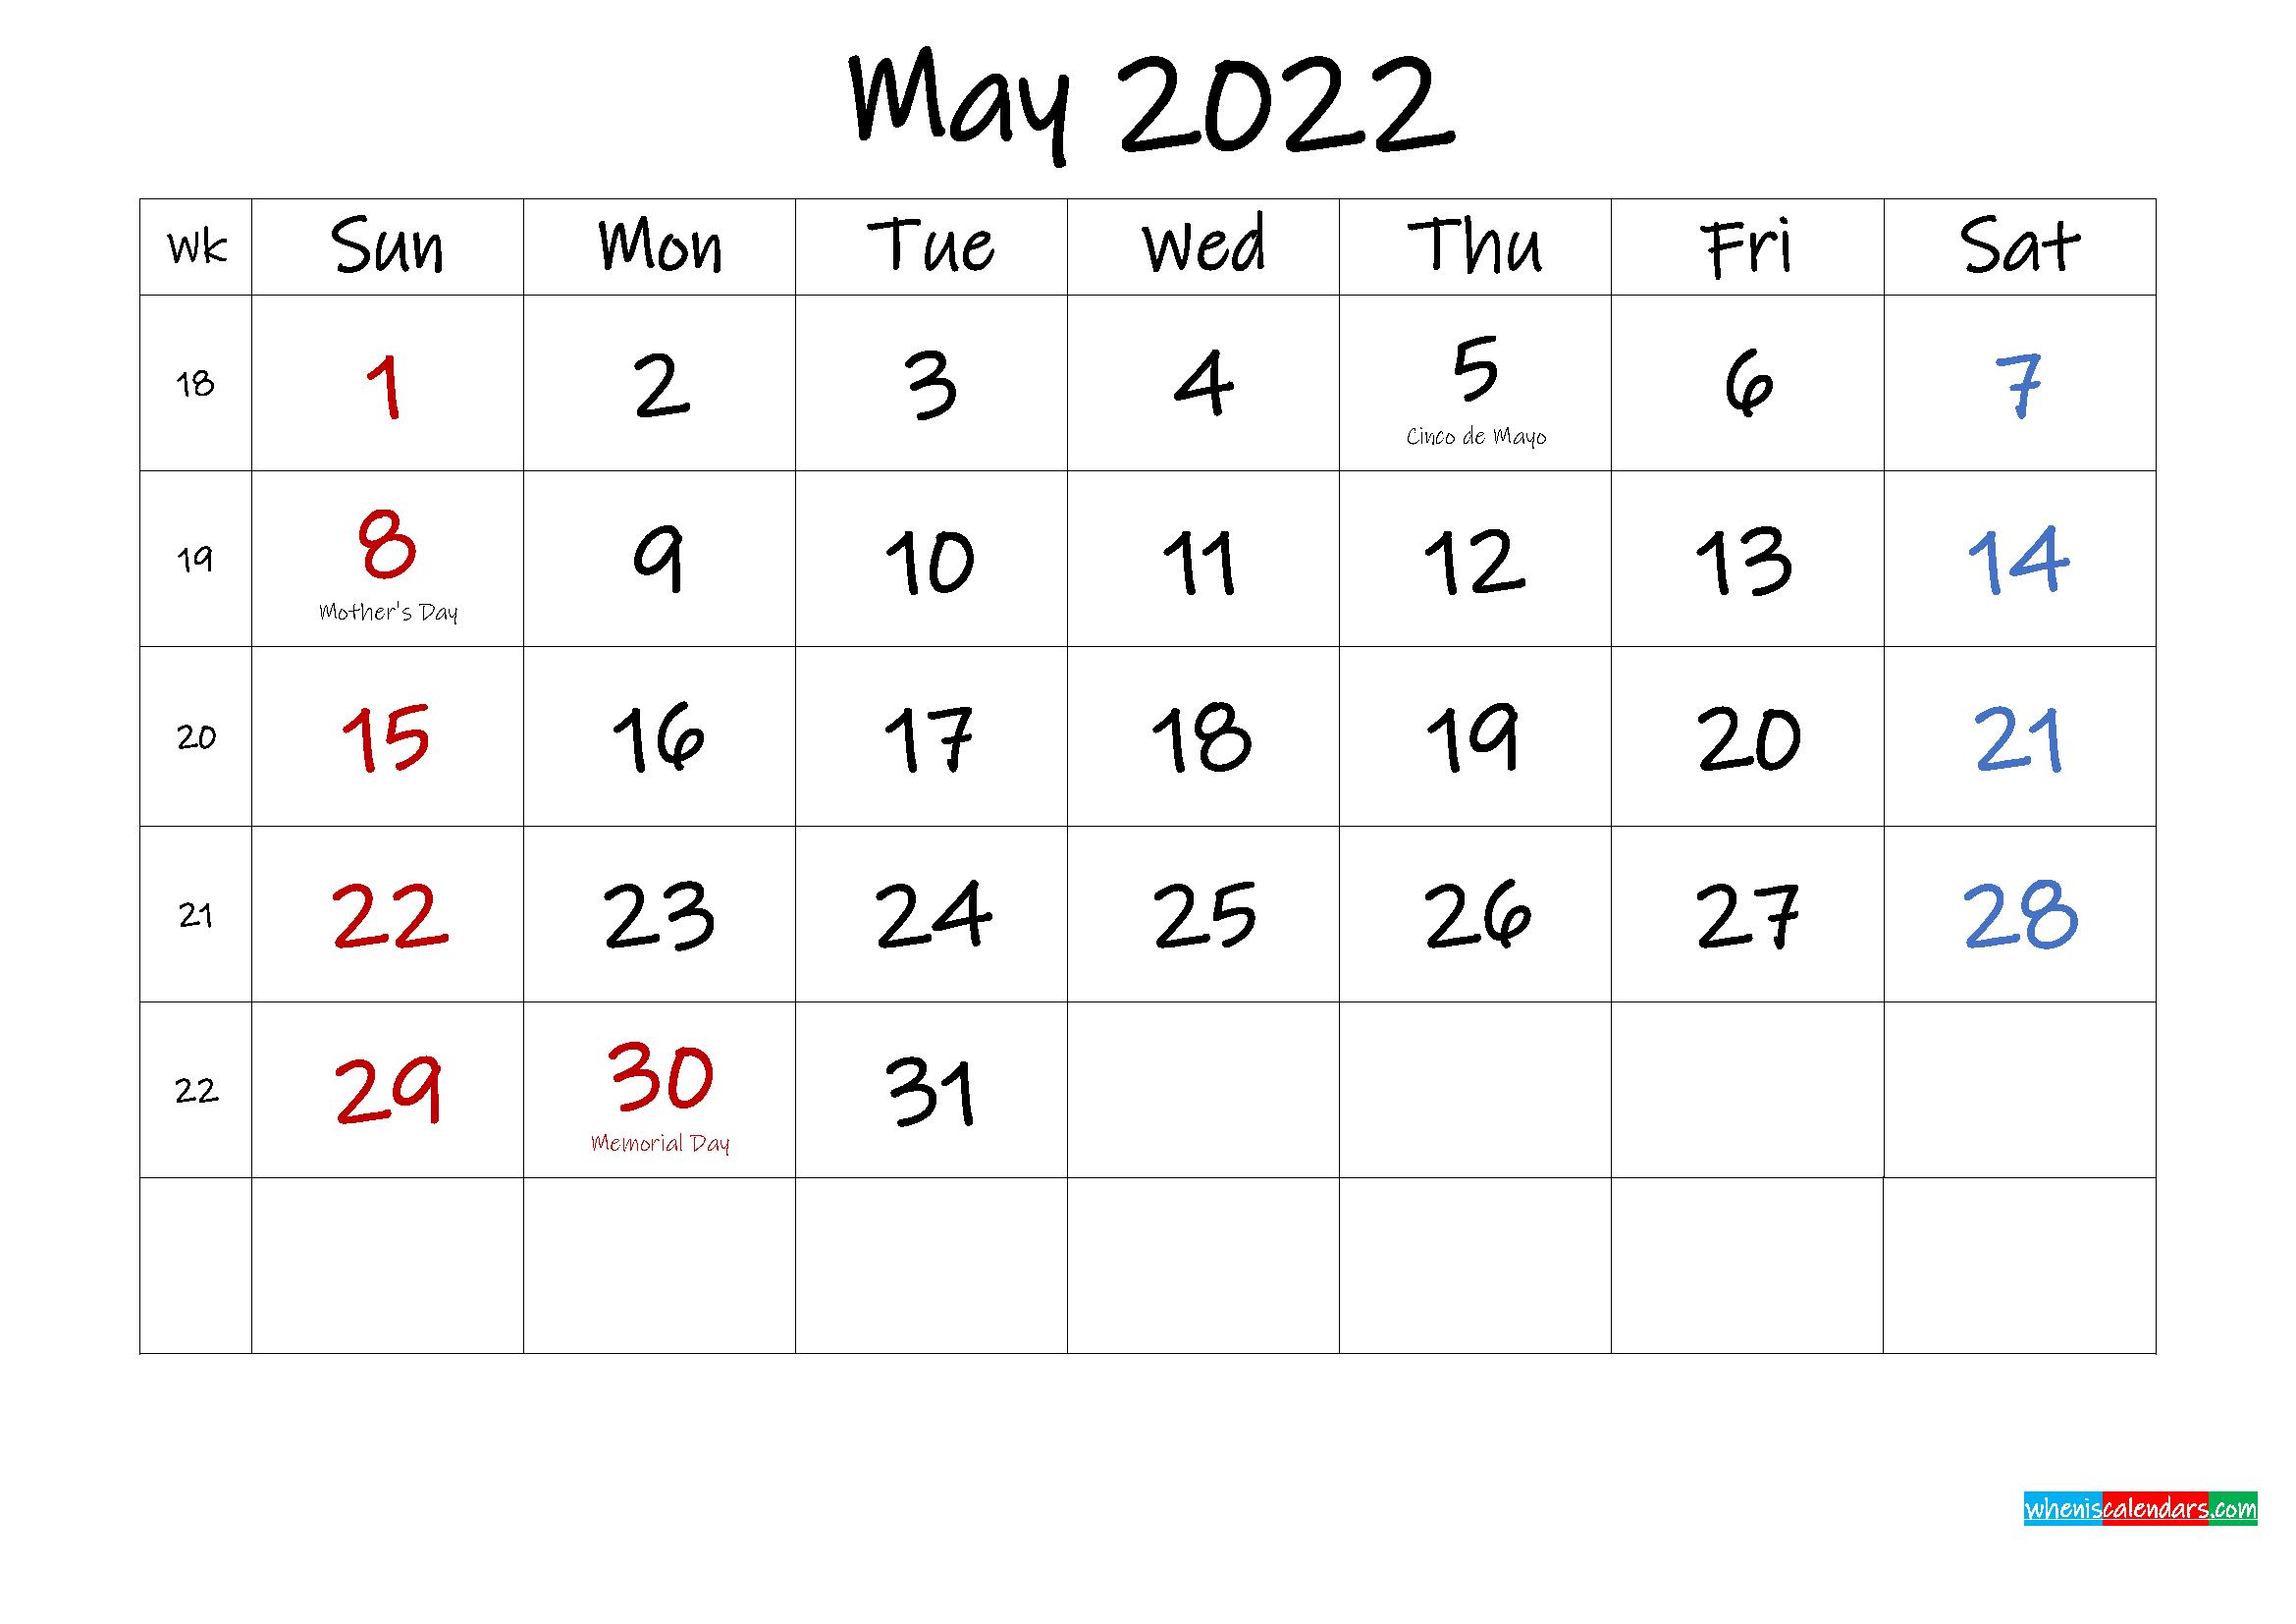 May 2022 Free Printable Calendar with Holidays